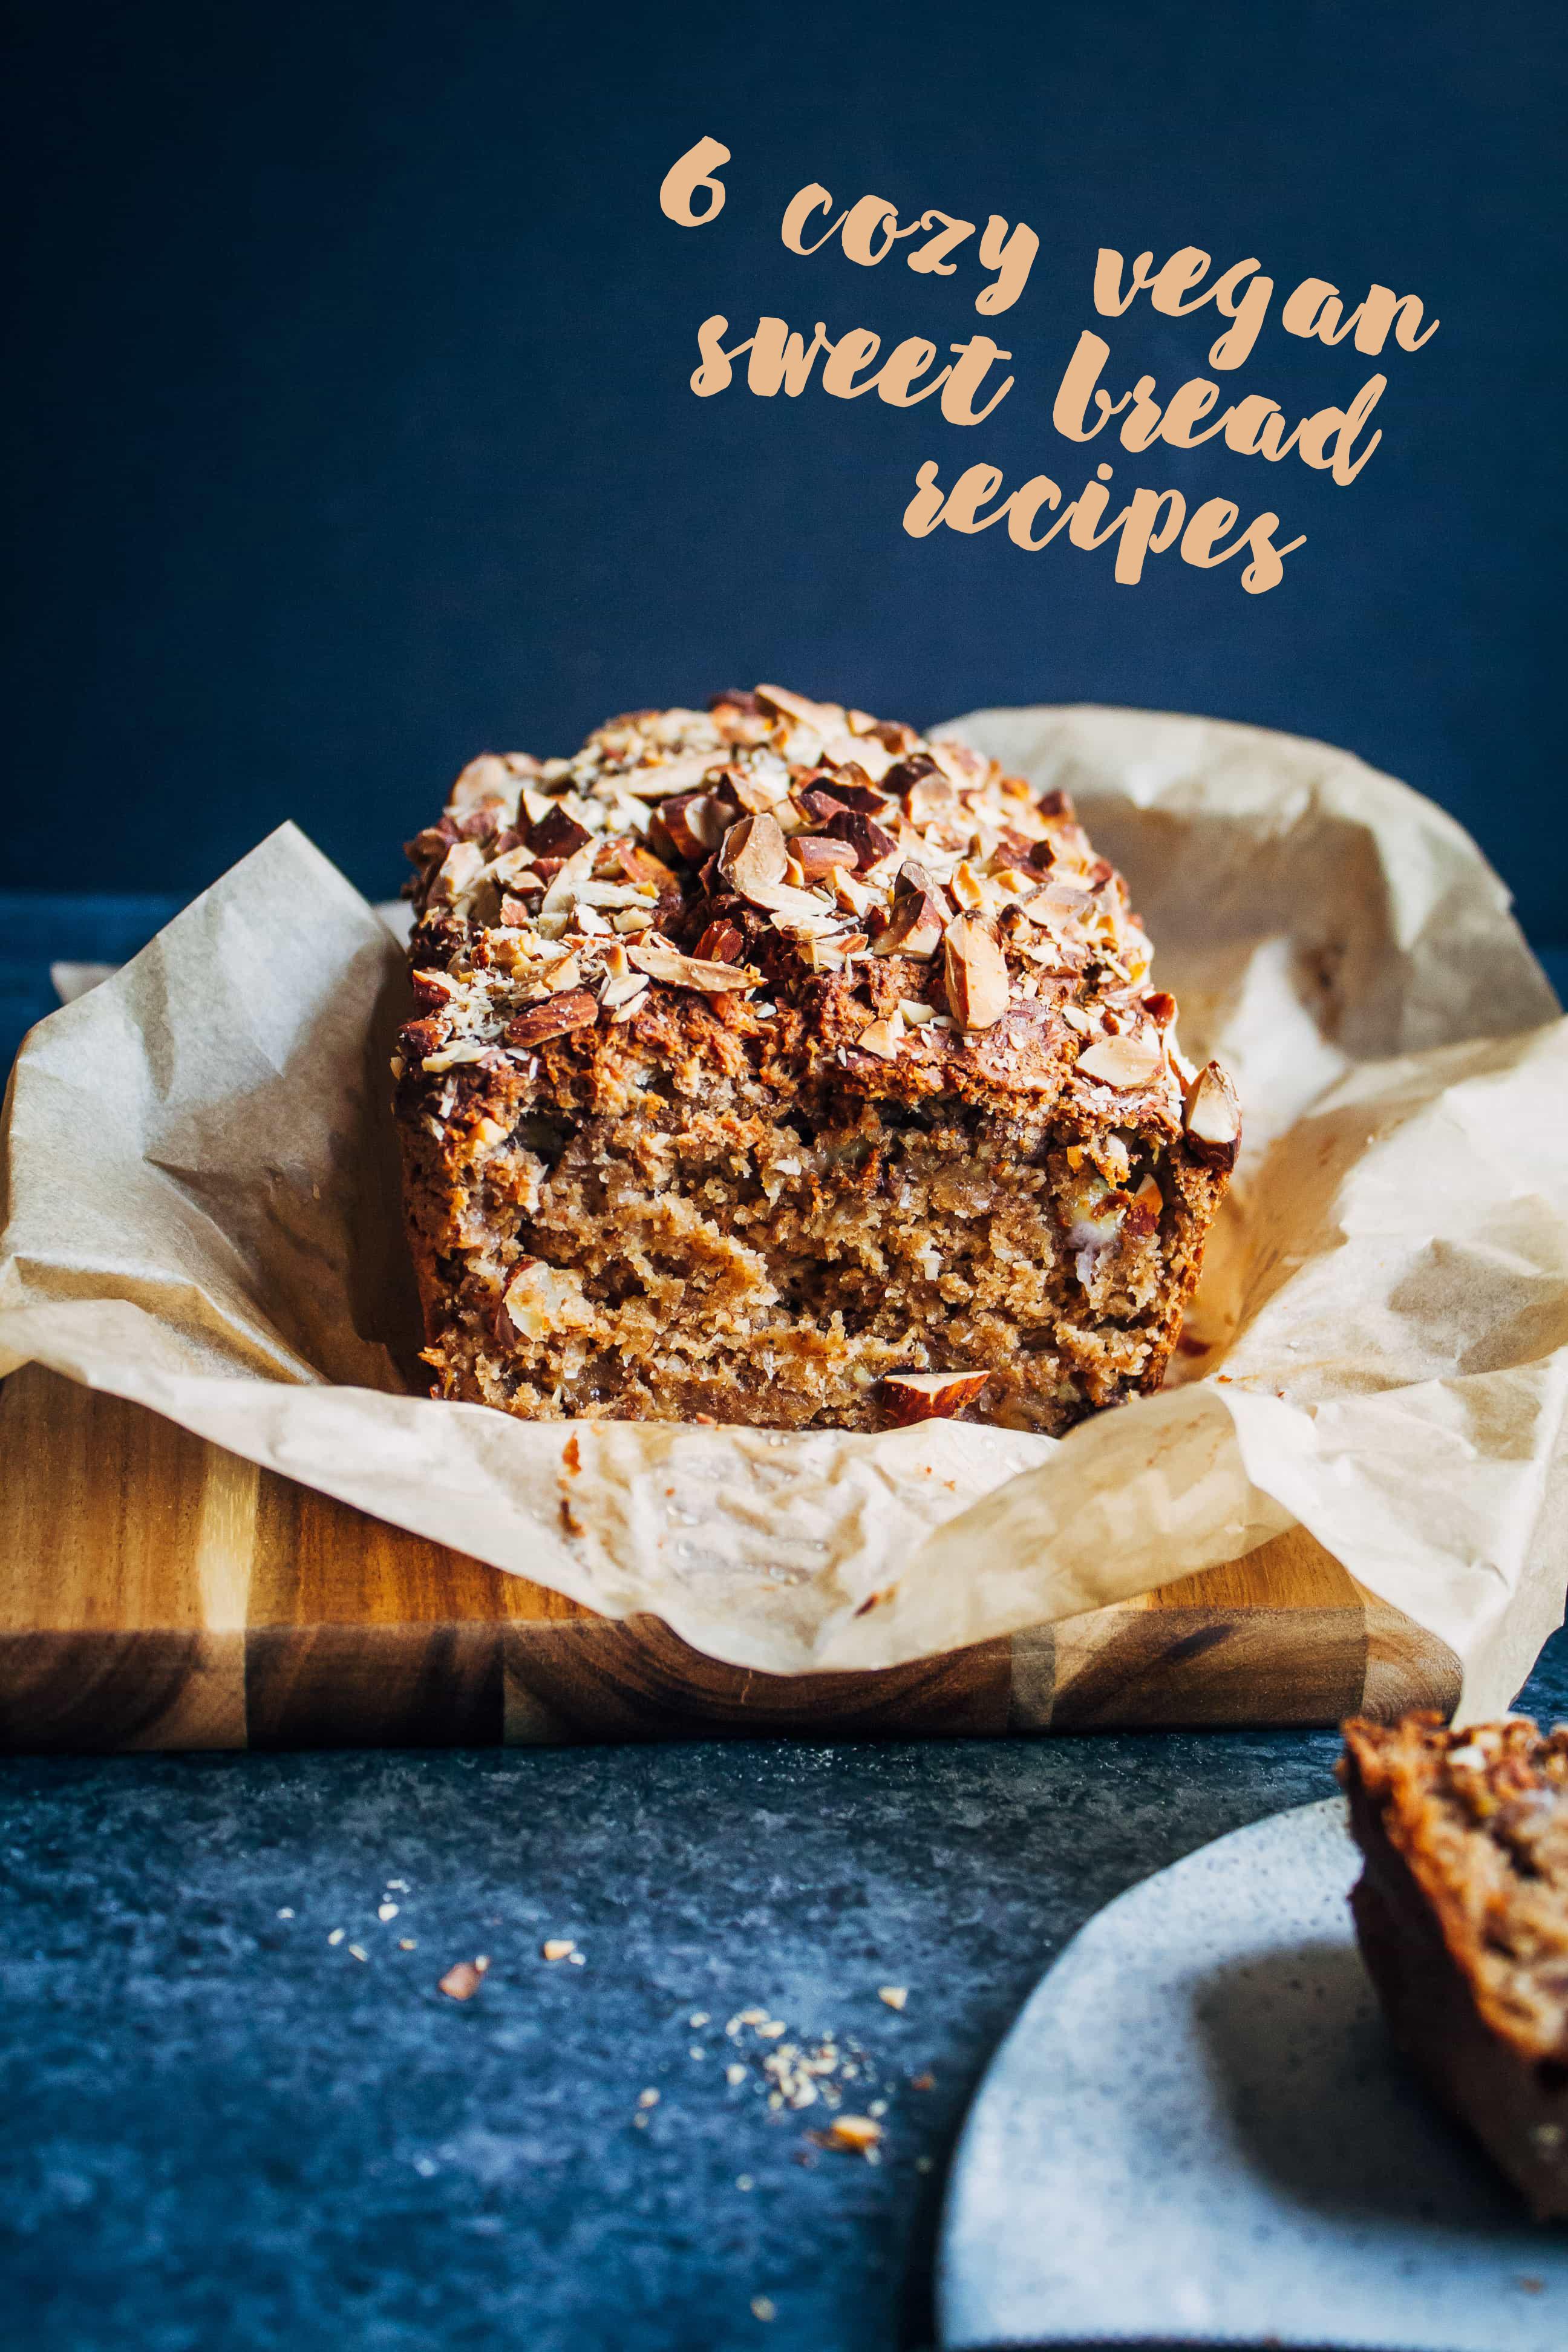 Vegan Sweet Bread Recipe  6 Cozy Vegan Sweet Bread Recipes